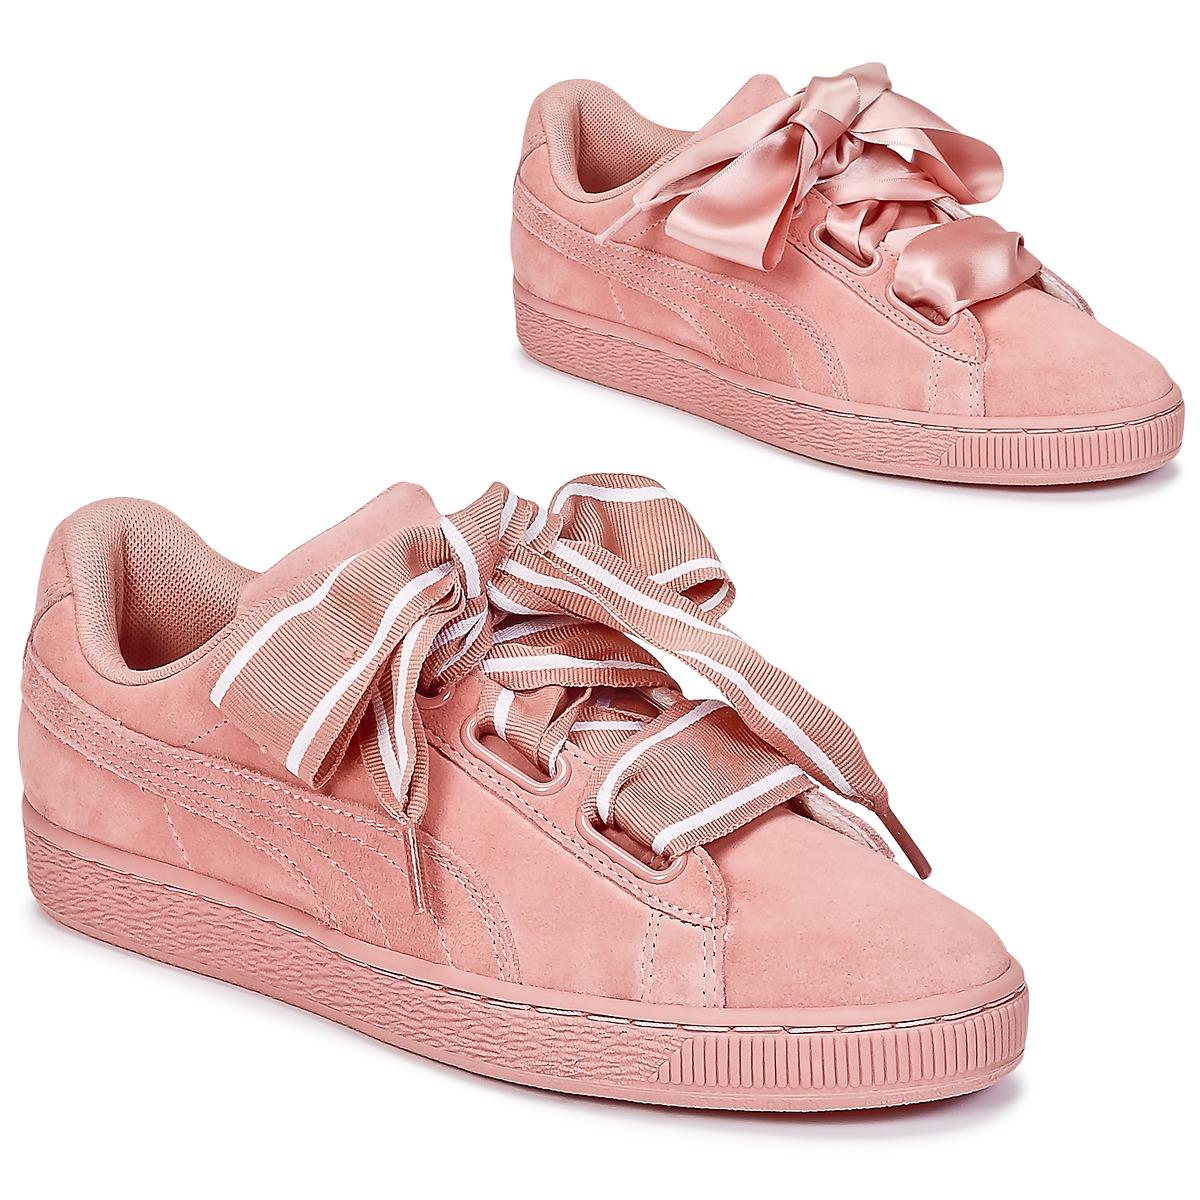 puma chaussure femme rose